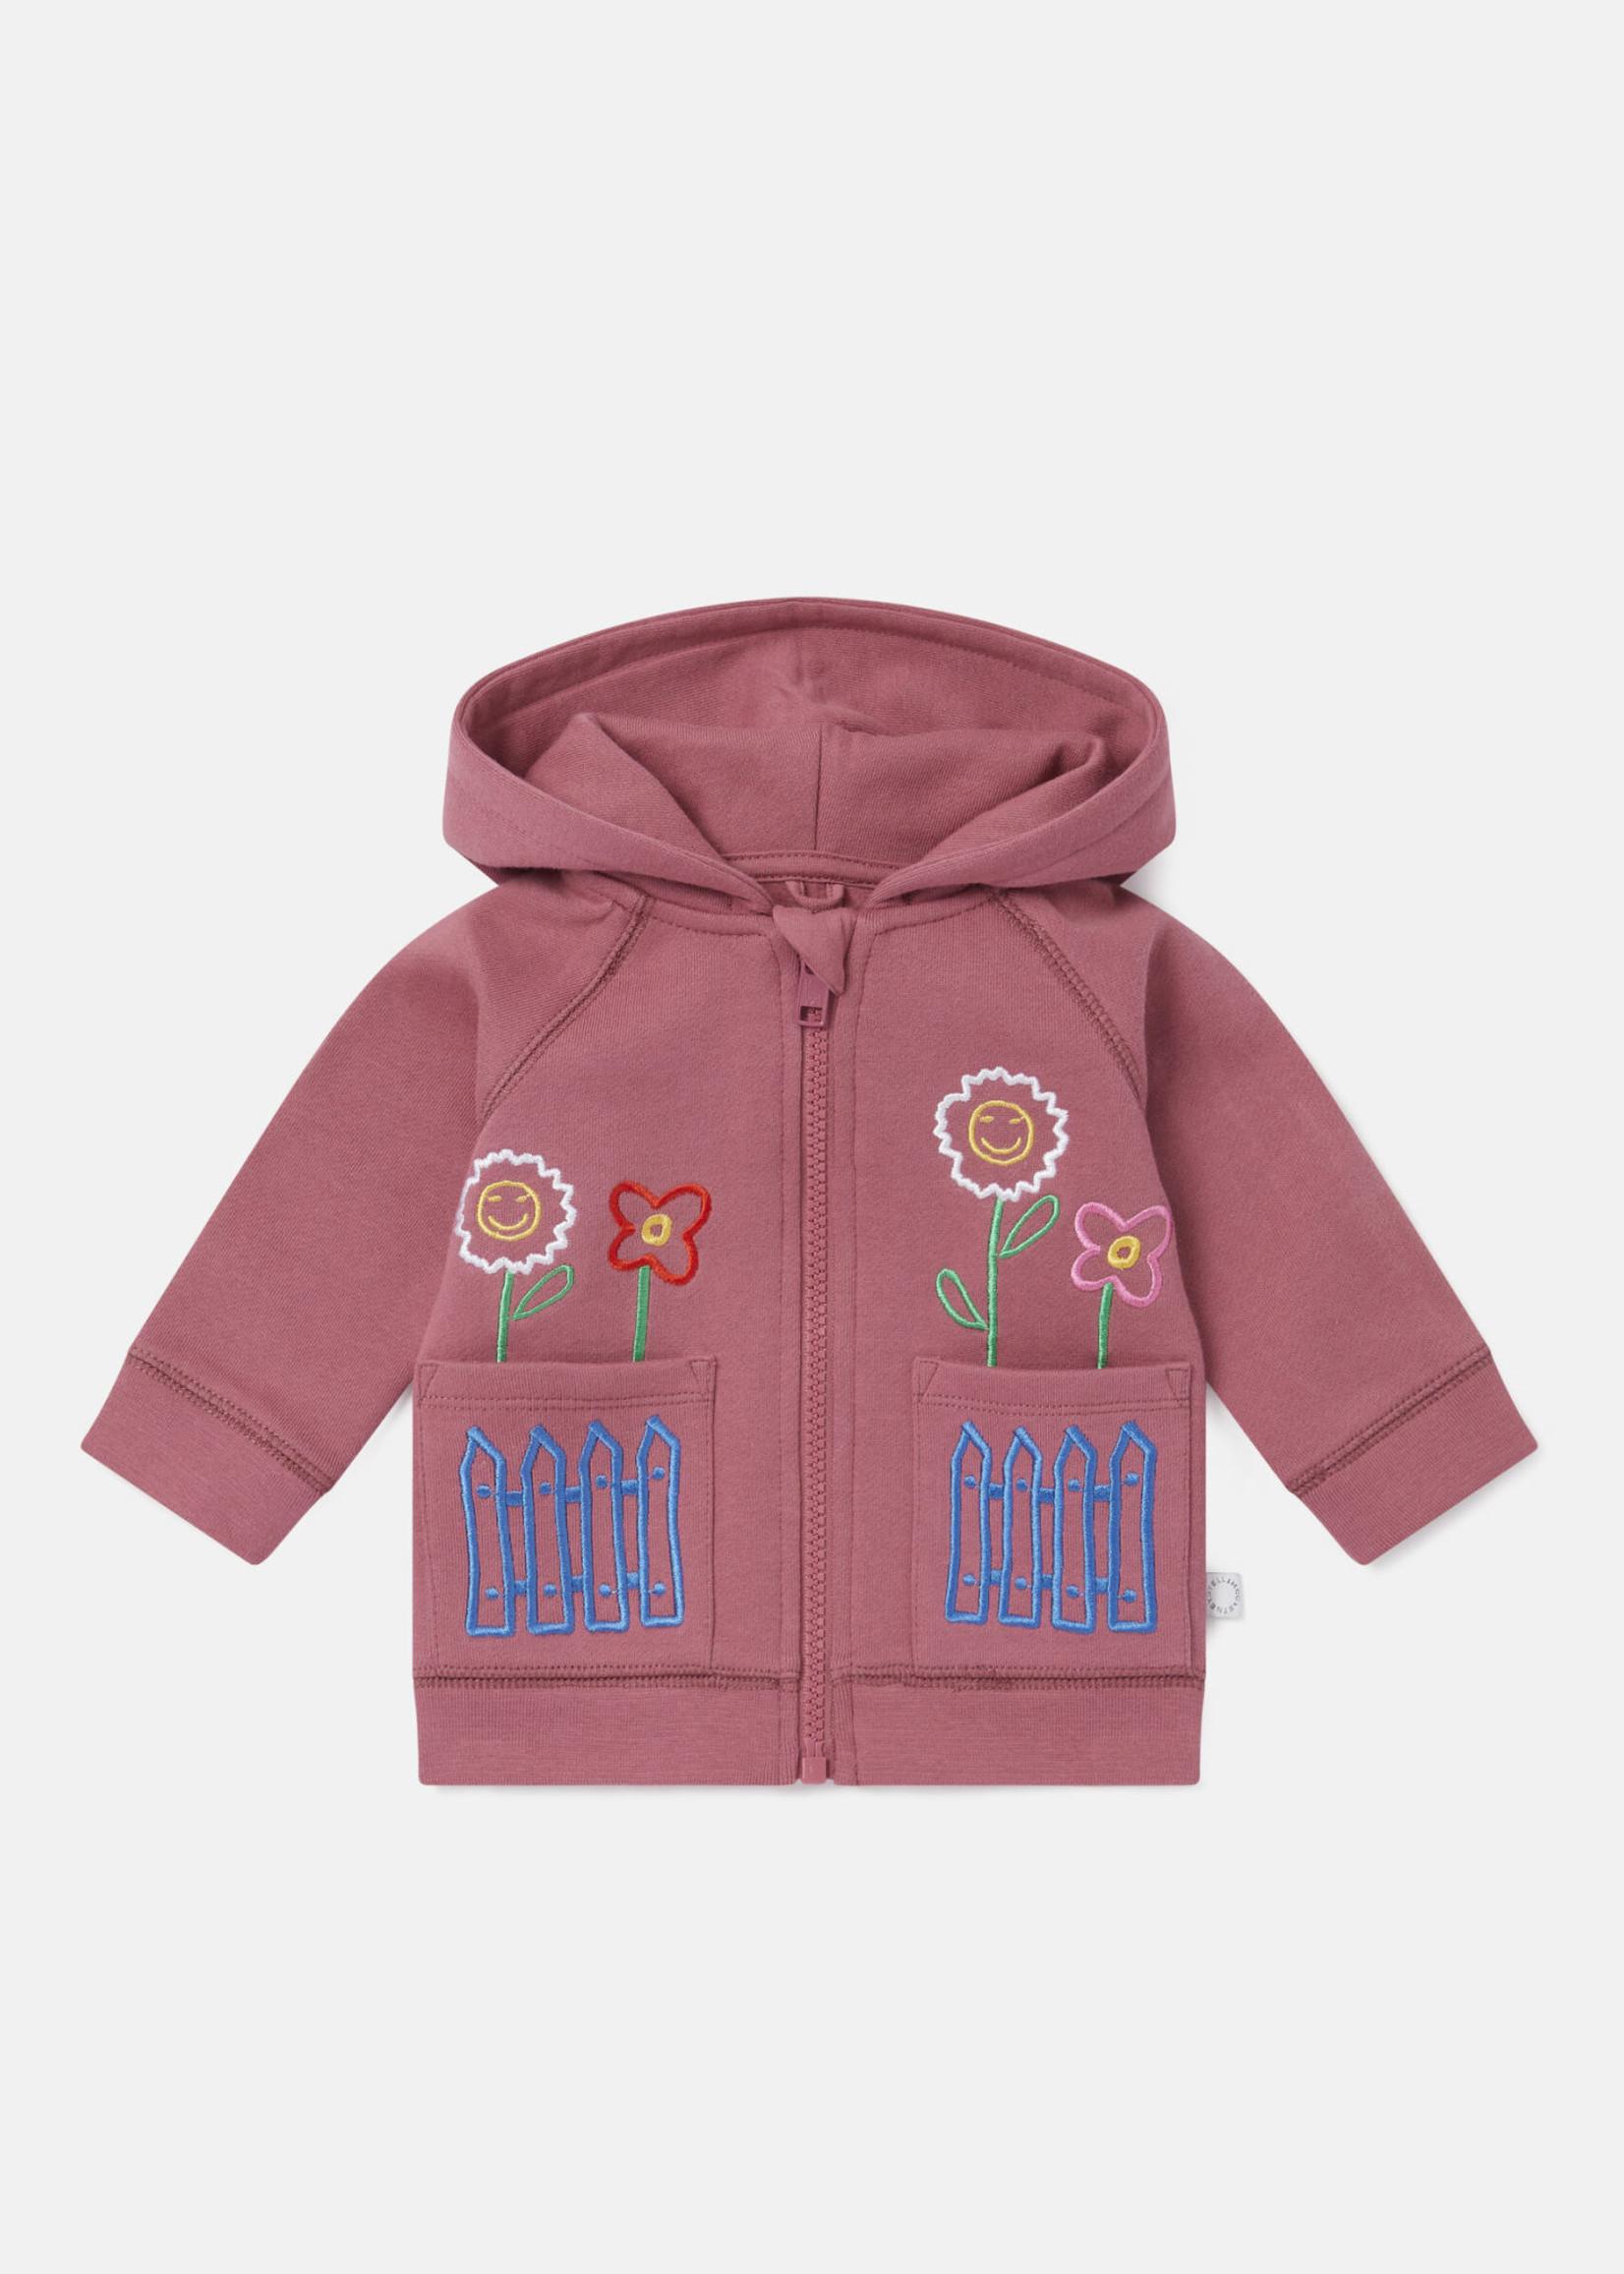 Stella McCartney Stella McCartney-AW21 603486 Garden Fleece Hoodie